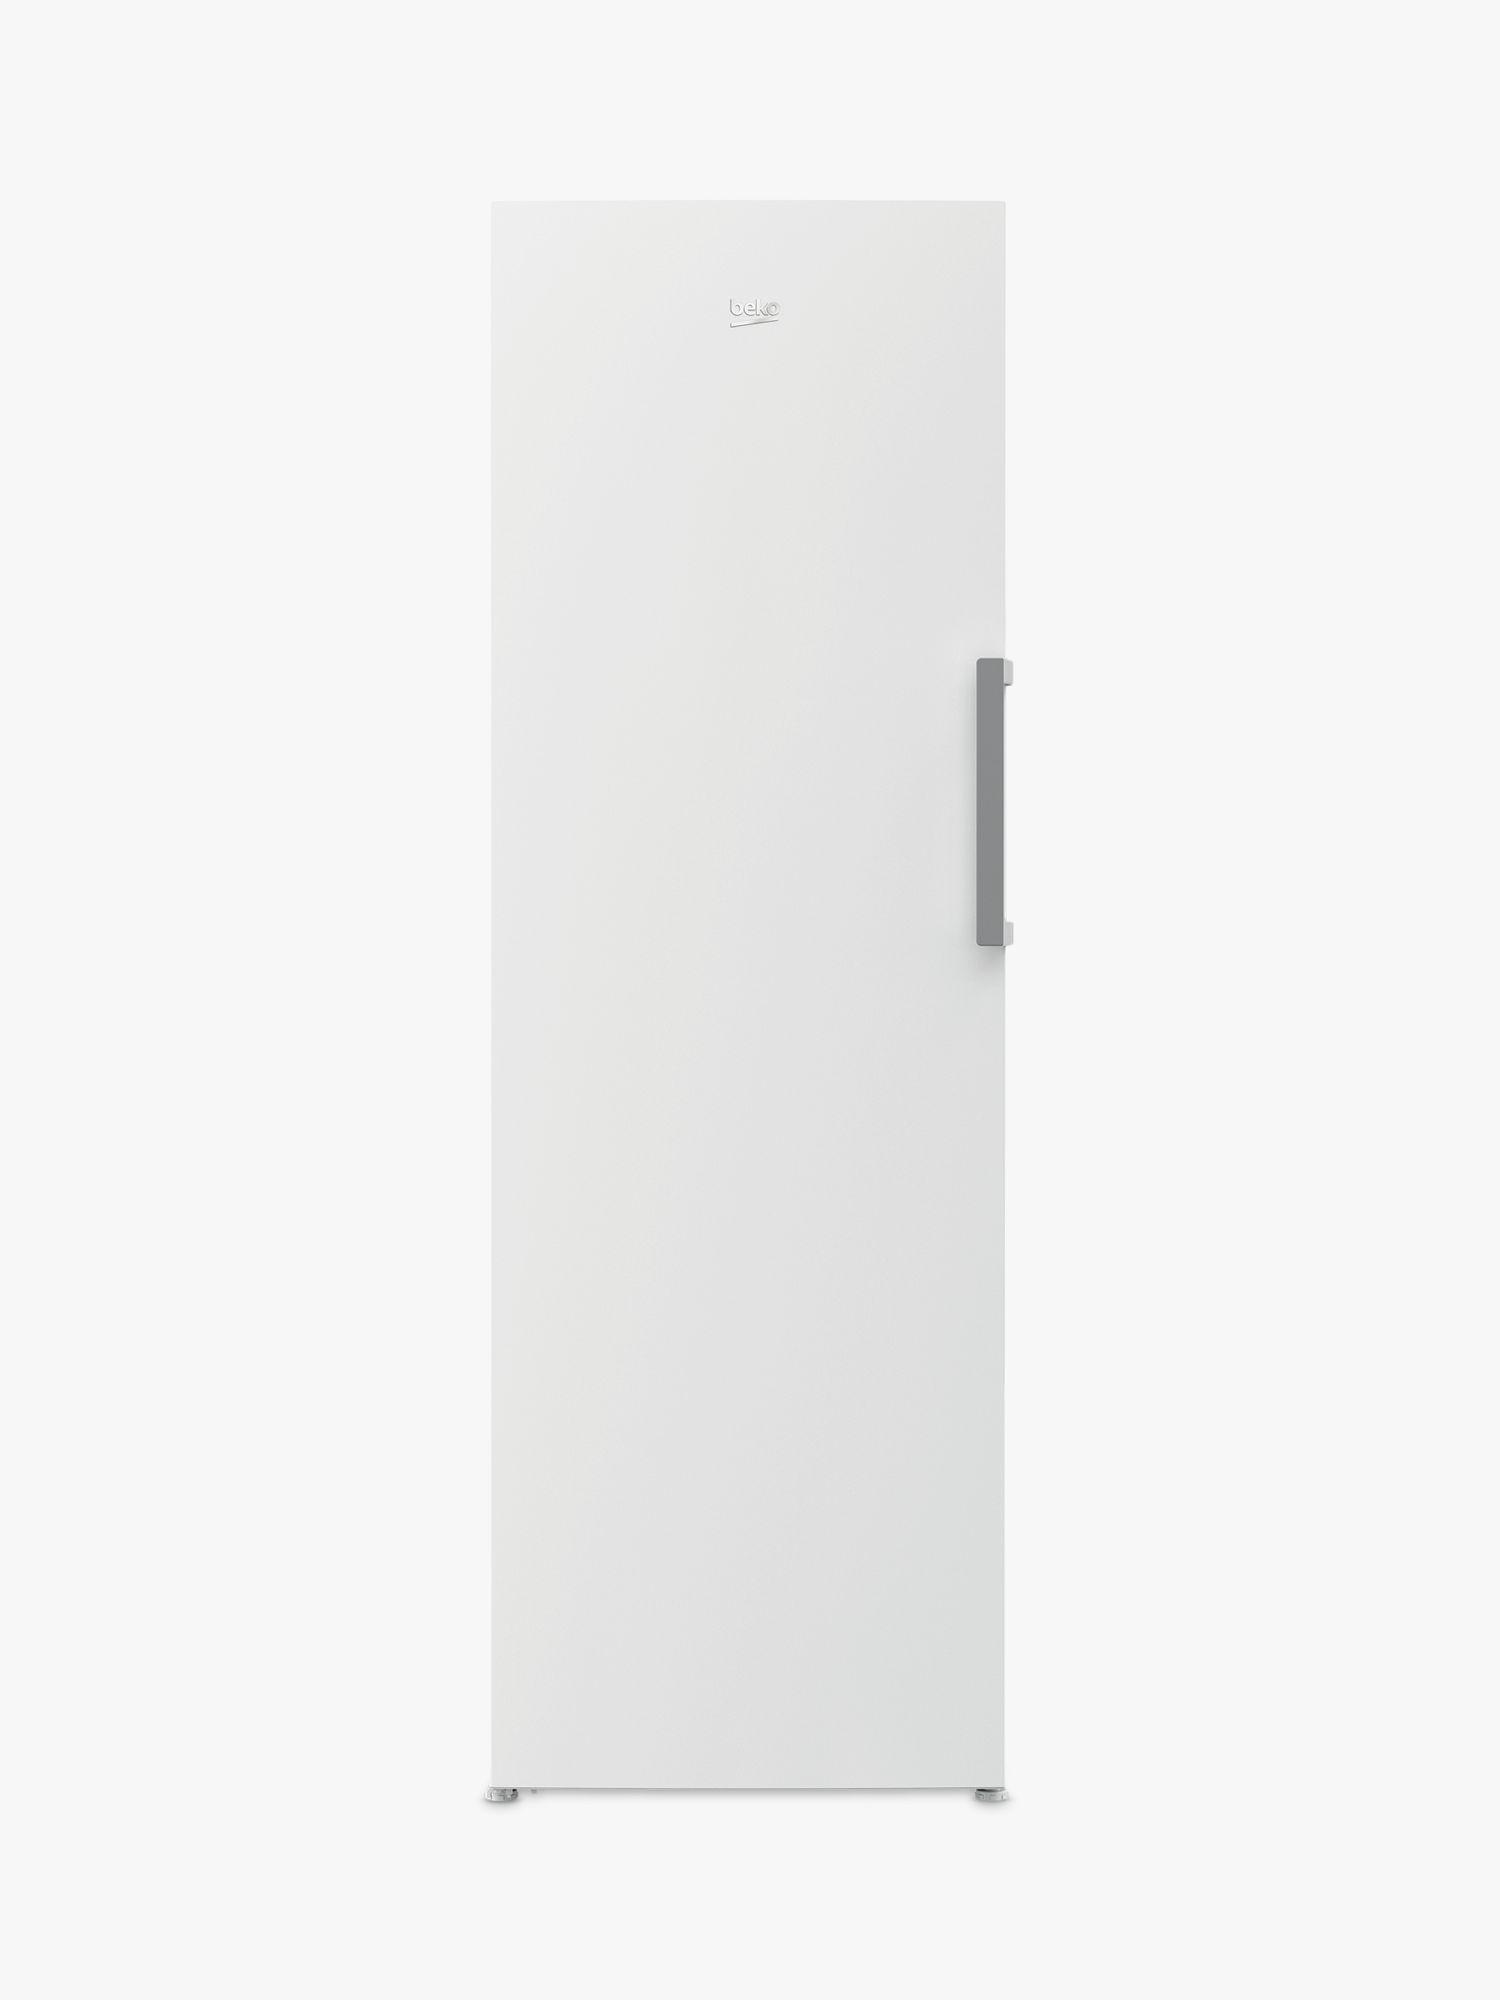 Beko Beko FJFP1685W Freestanding Freezer, A+ Energy Rating, White